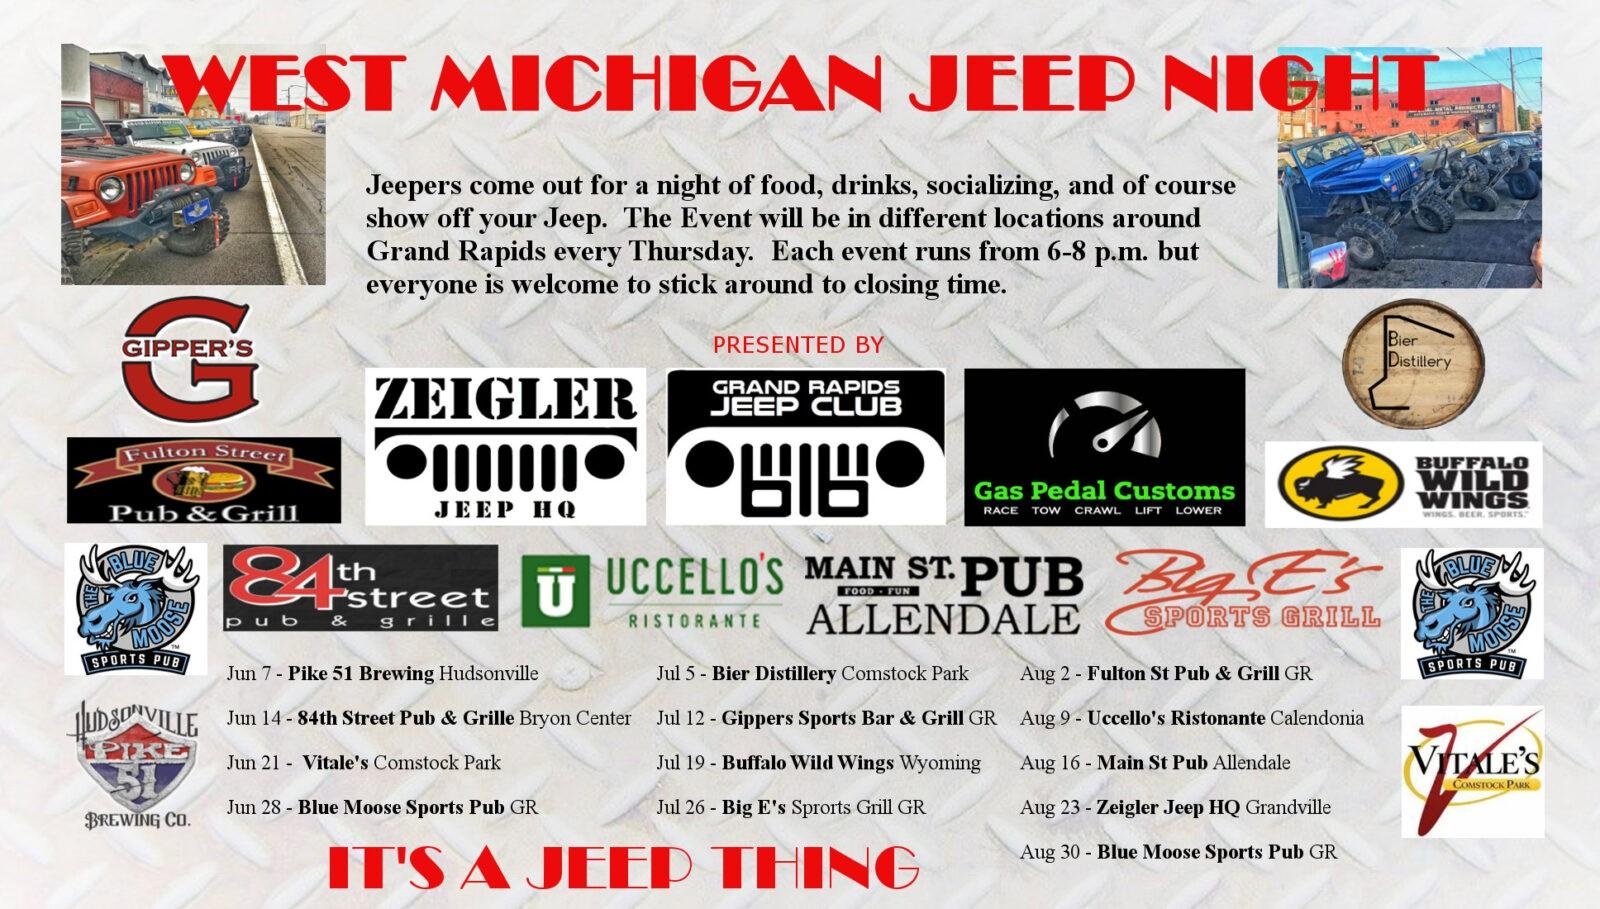 West Michigan Jeep Night - Gas Pedal Customs